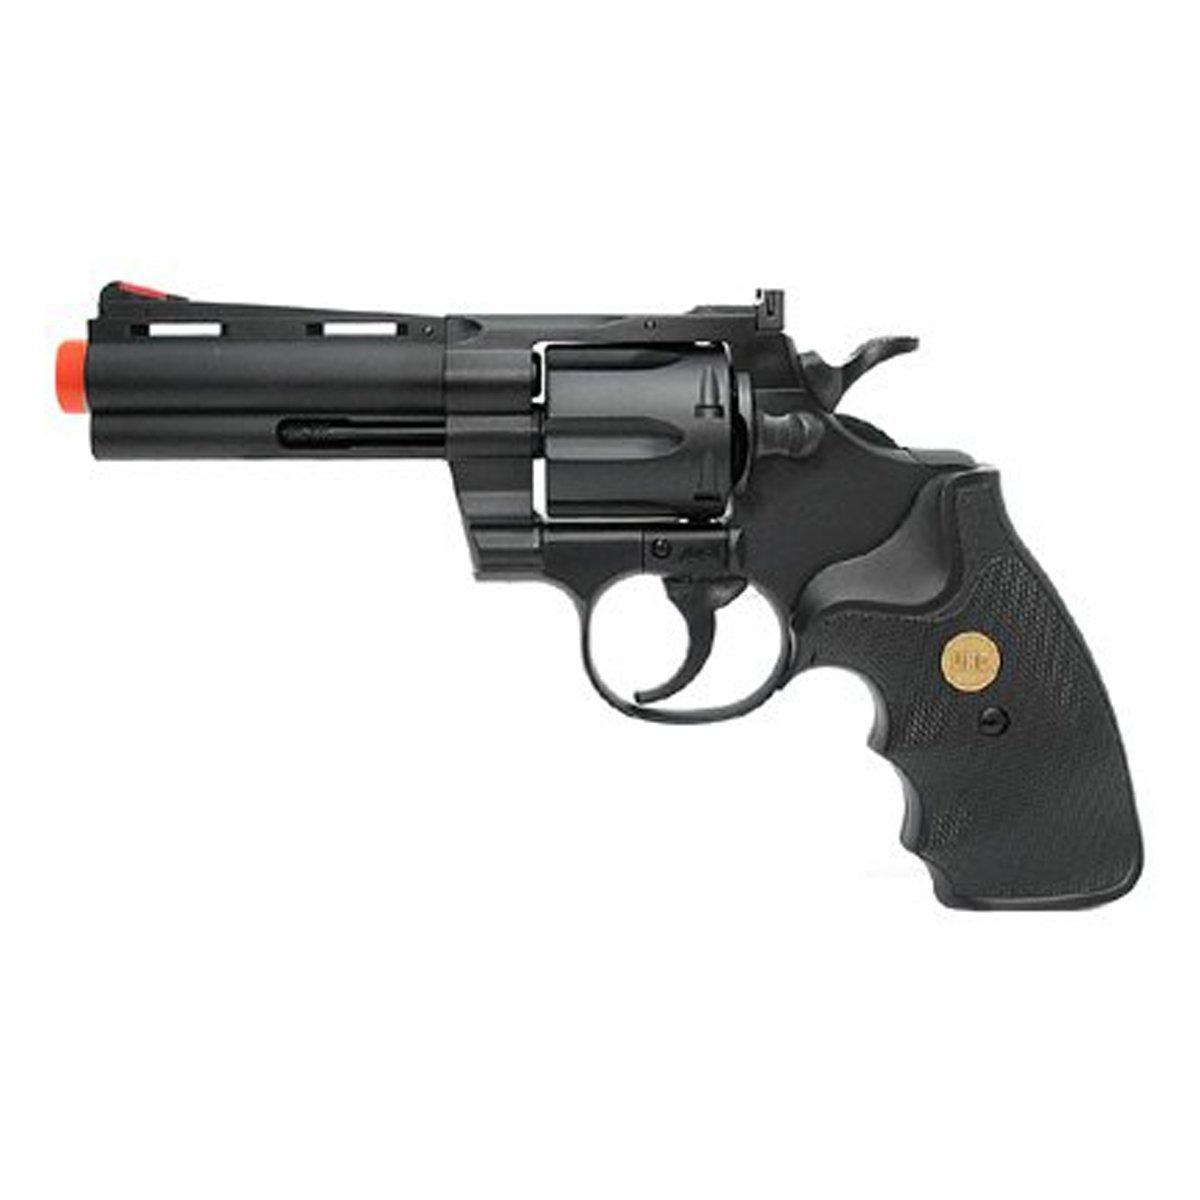 UHC 937 black Airsoft Gun